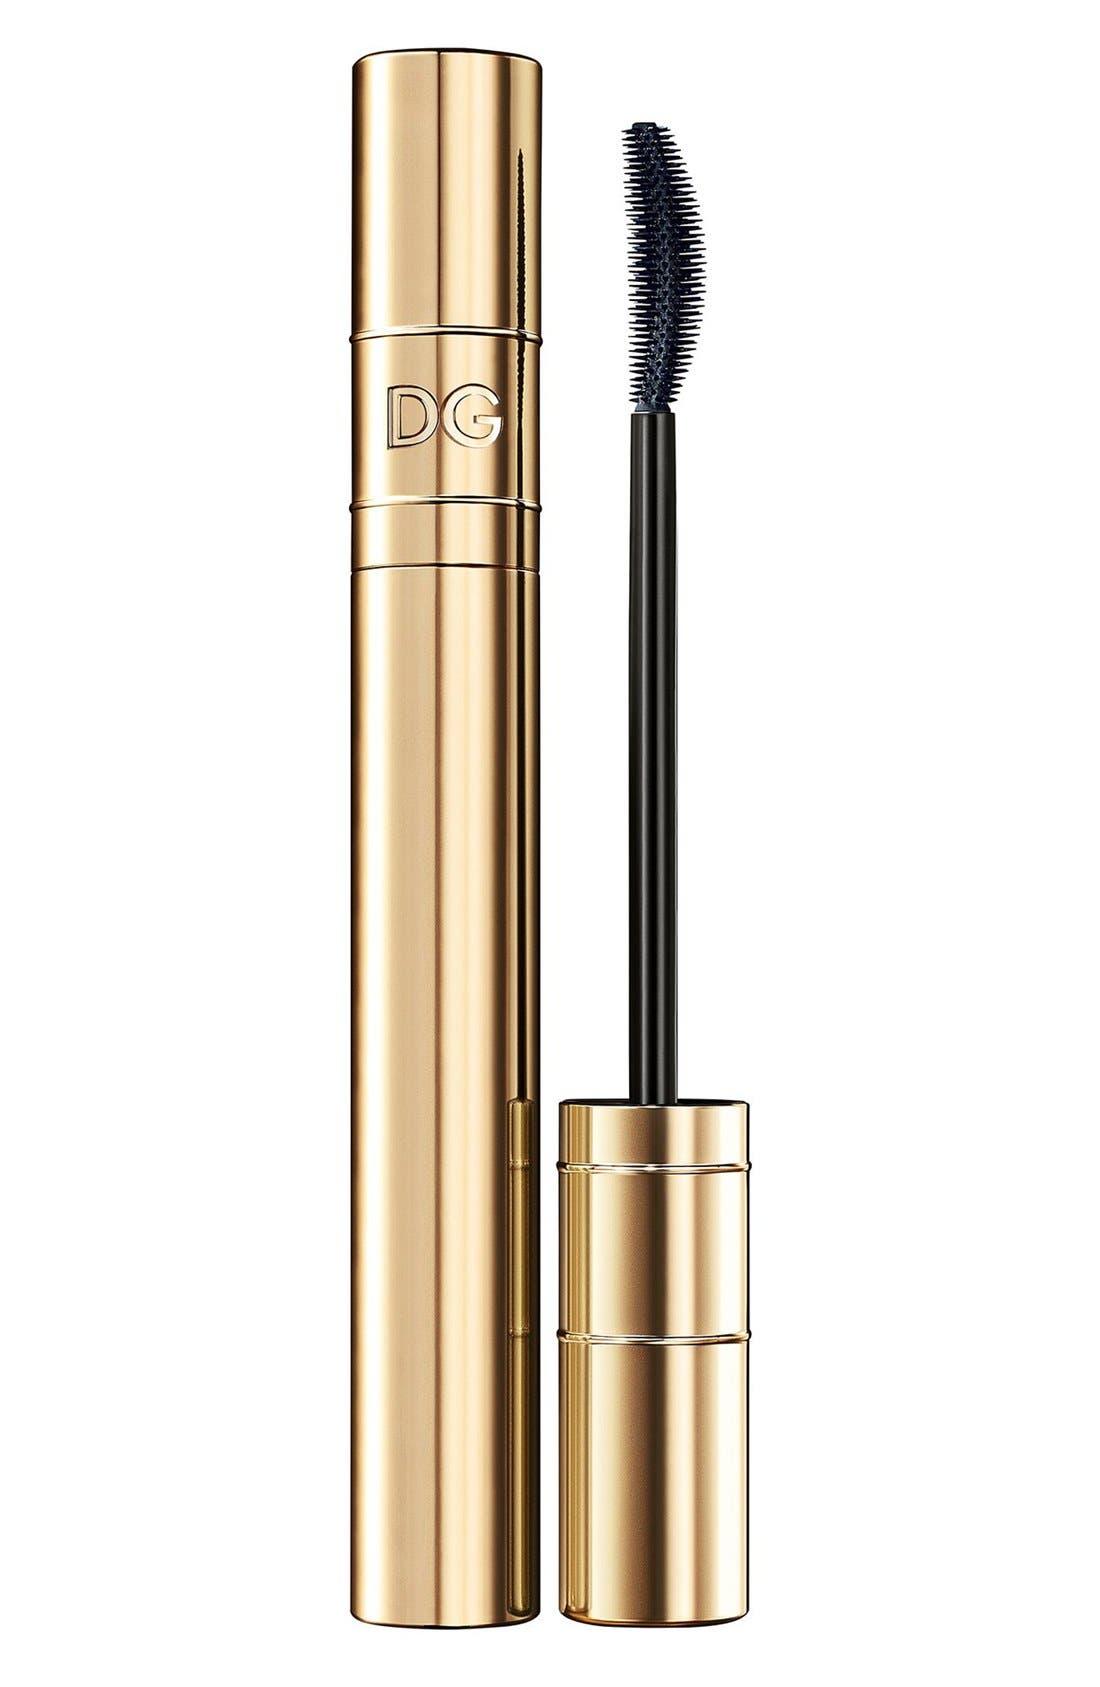 Dolce&Gabbana Beauty Passioneyes Curl & Volume Mascara